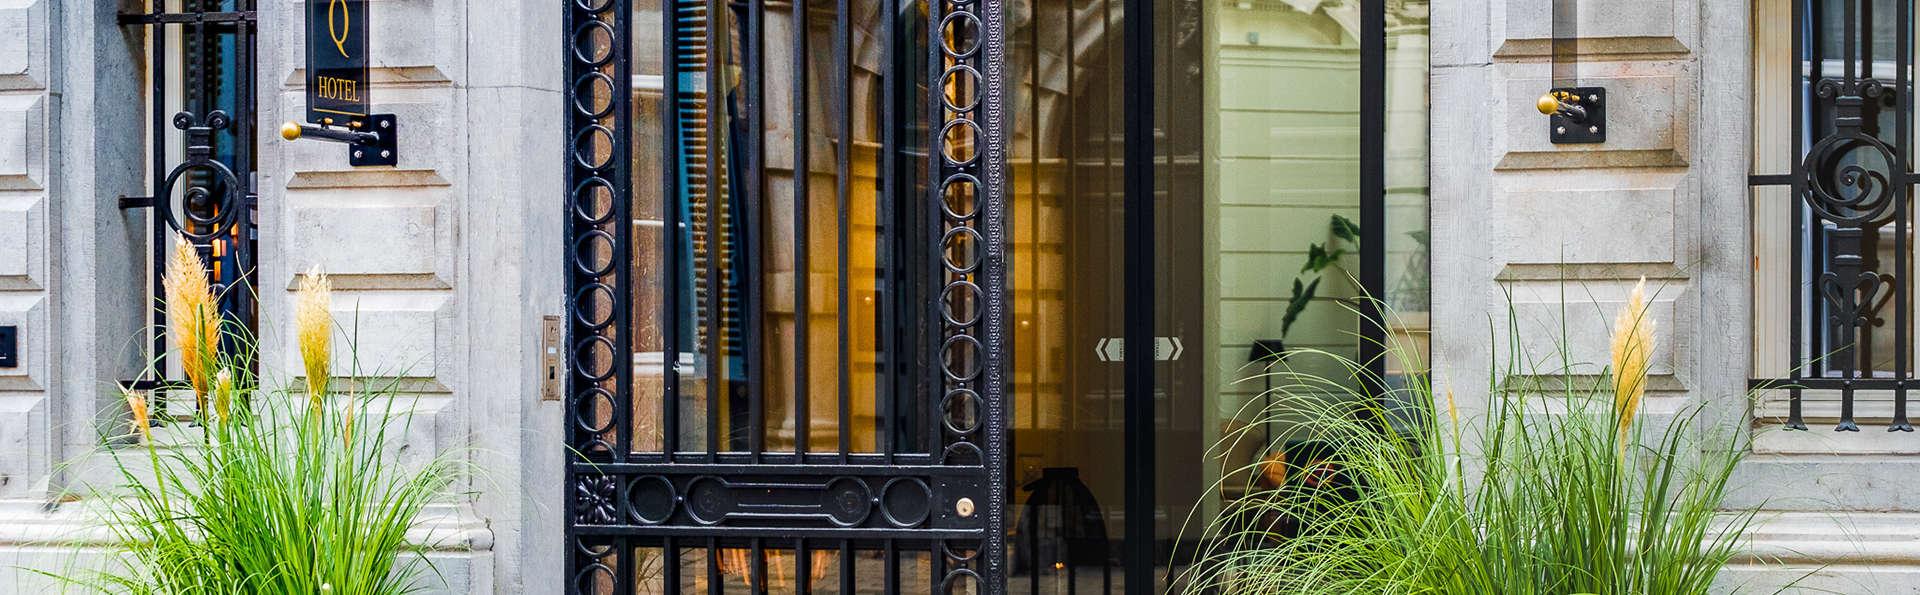 Relais & Châteaux Hotel FRANQ - Edit_Front.jpg